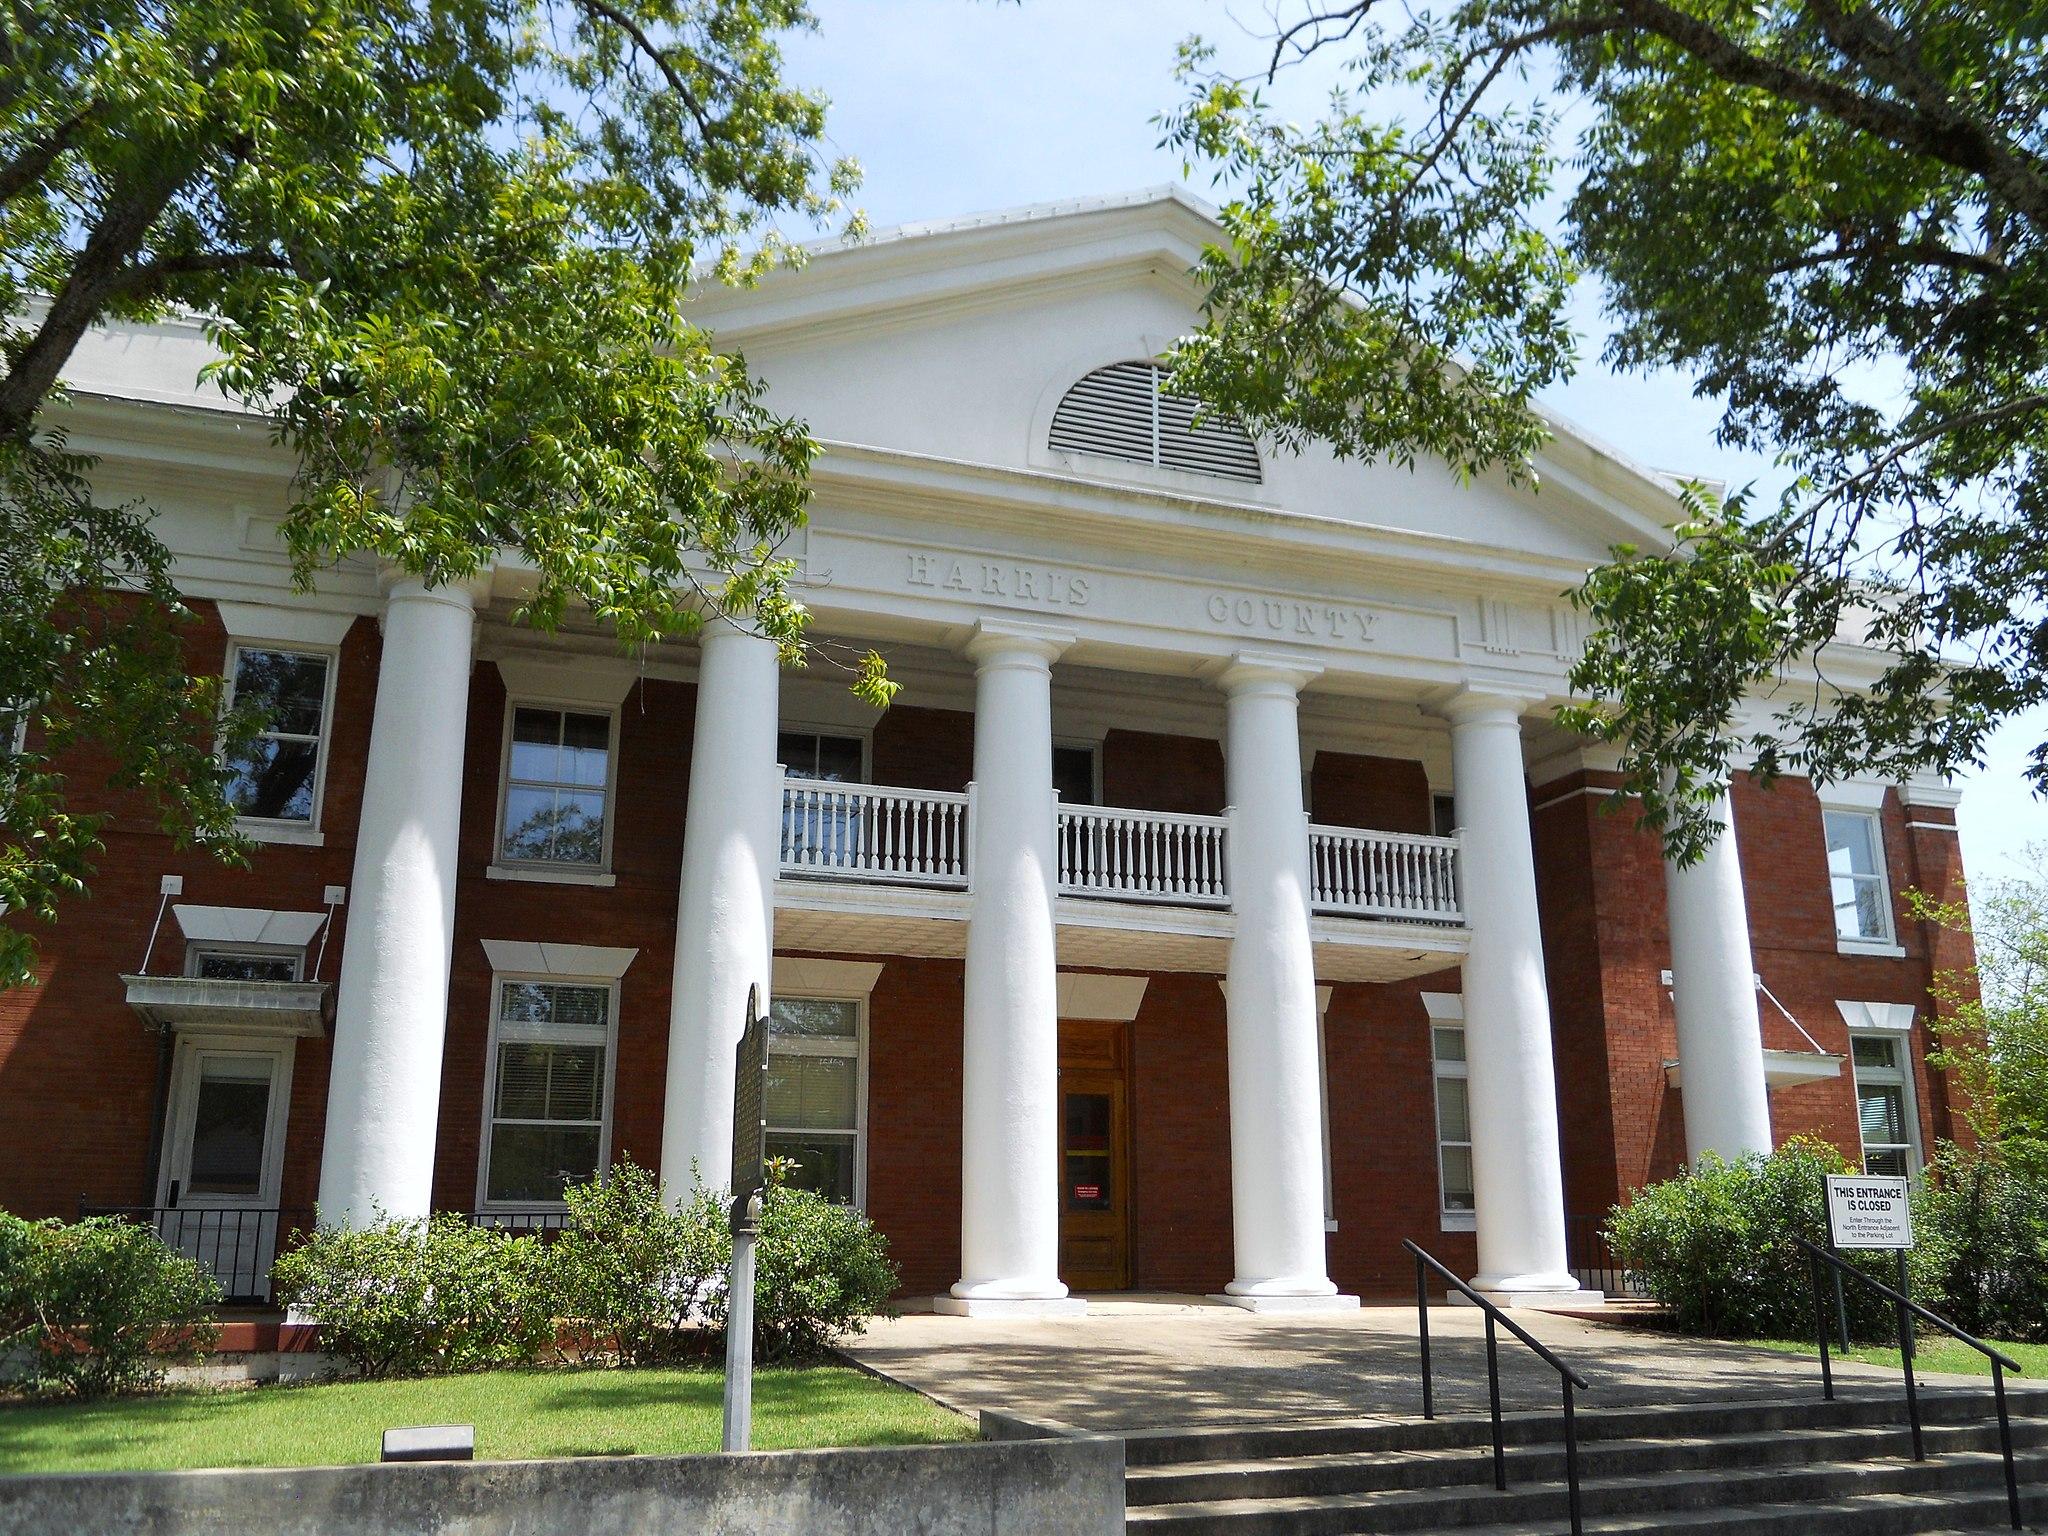 Harris County Georgia Courthouse